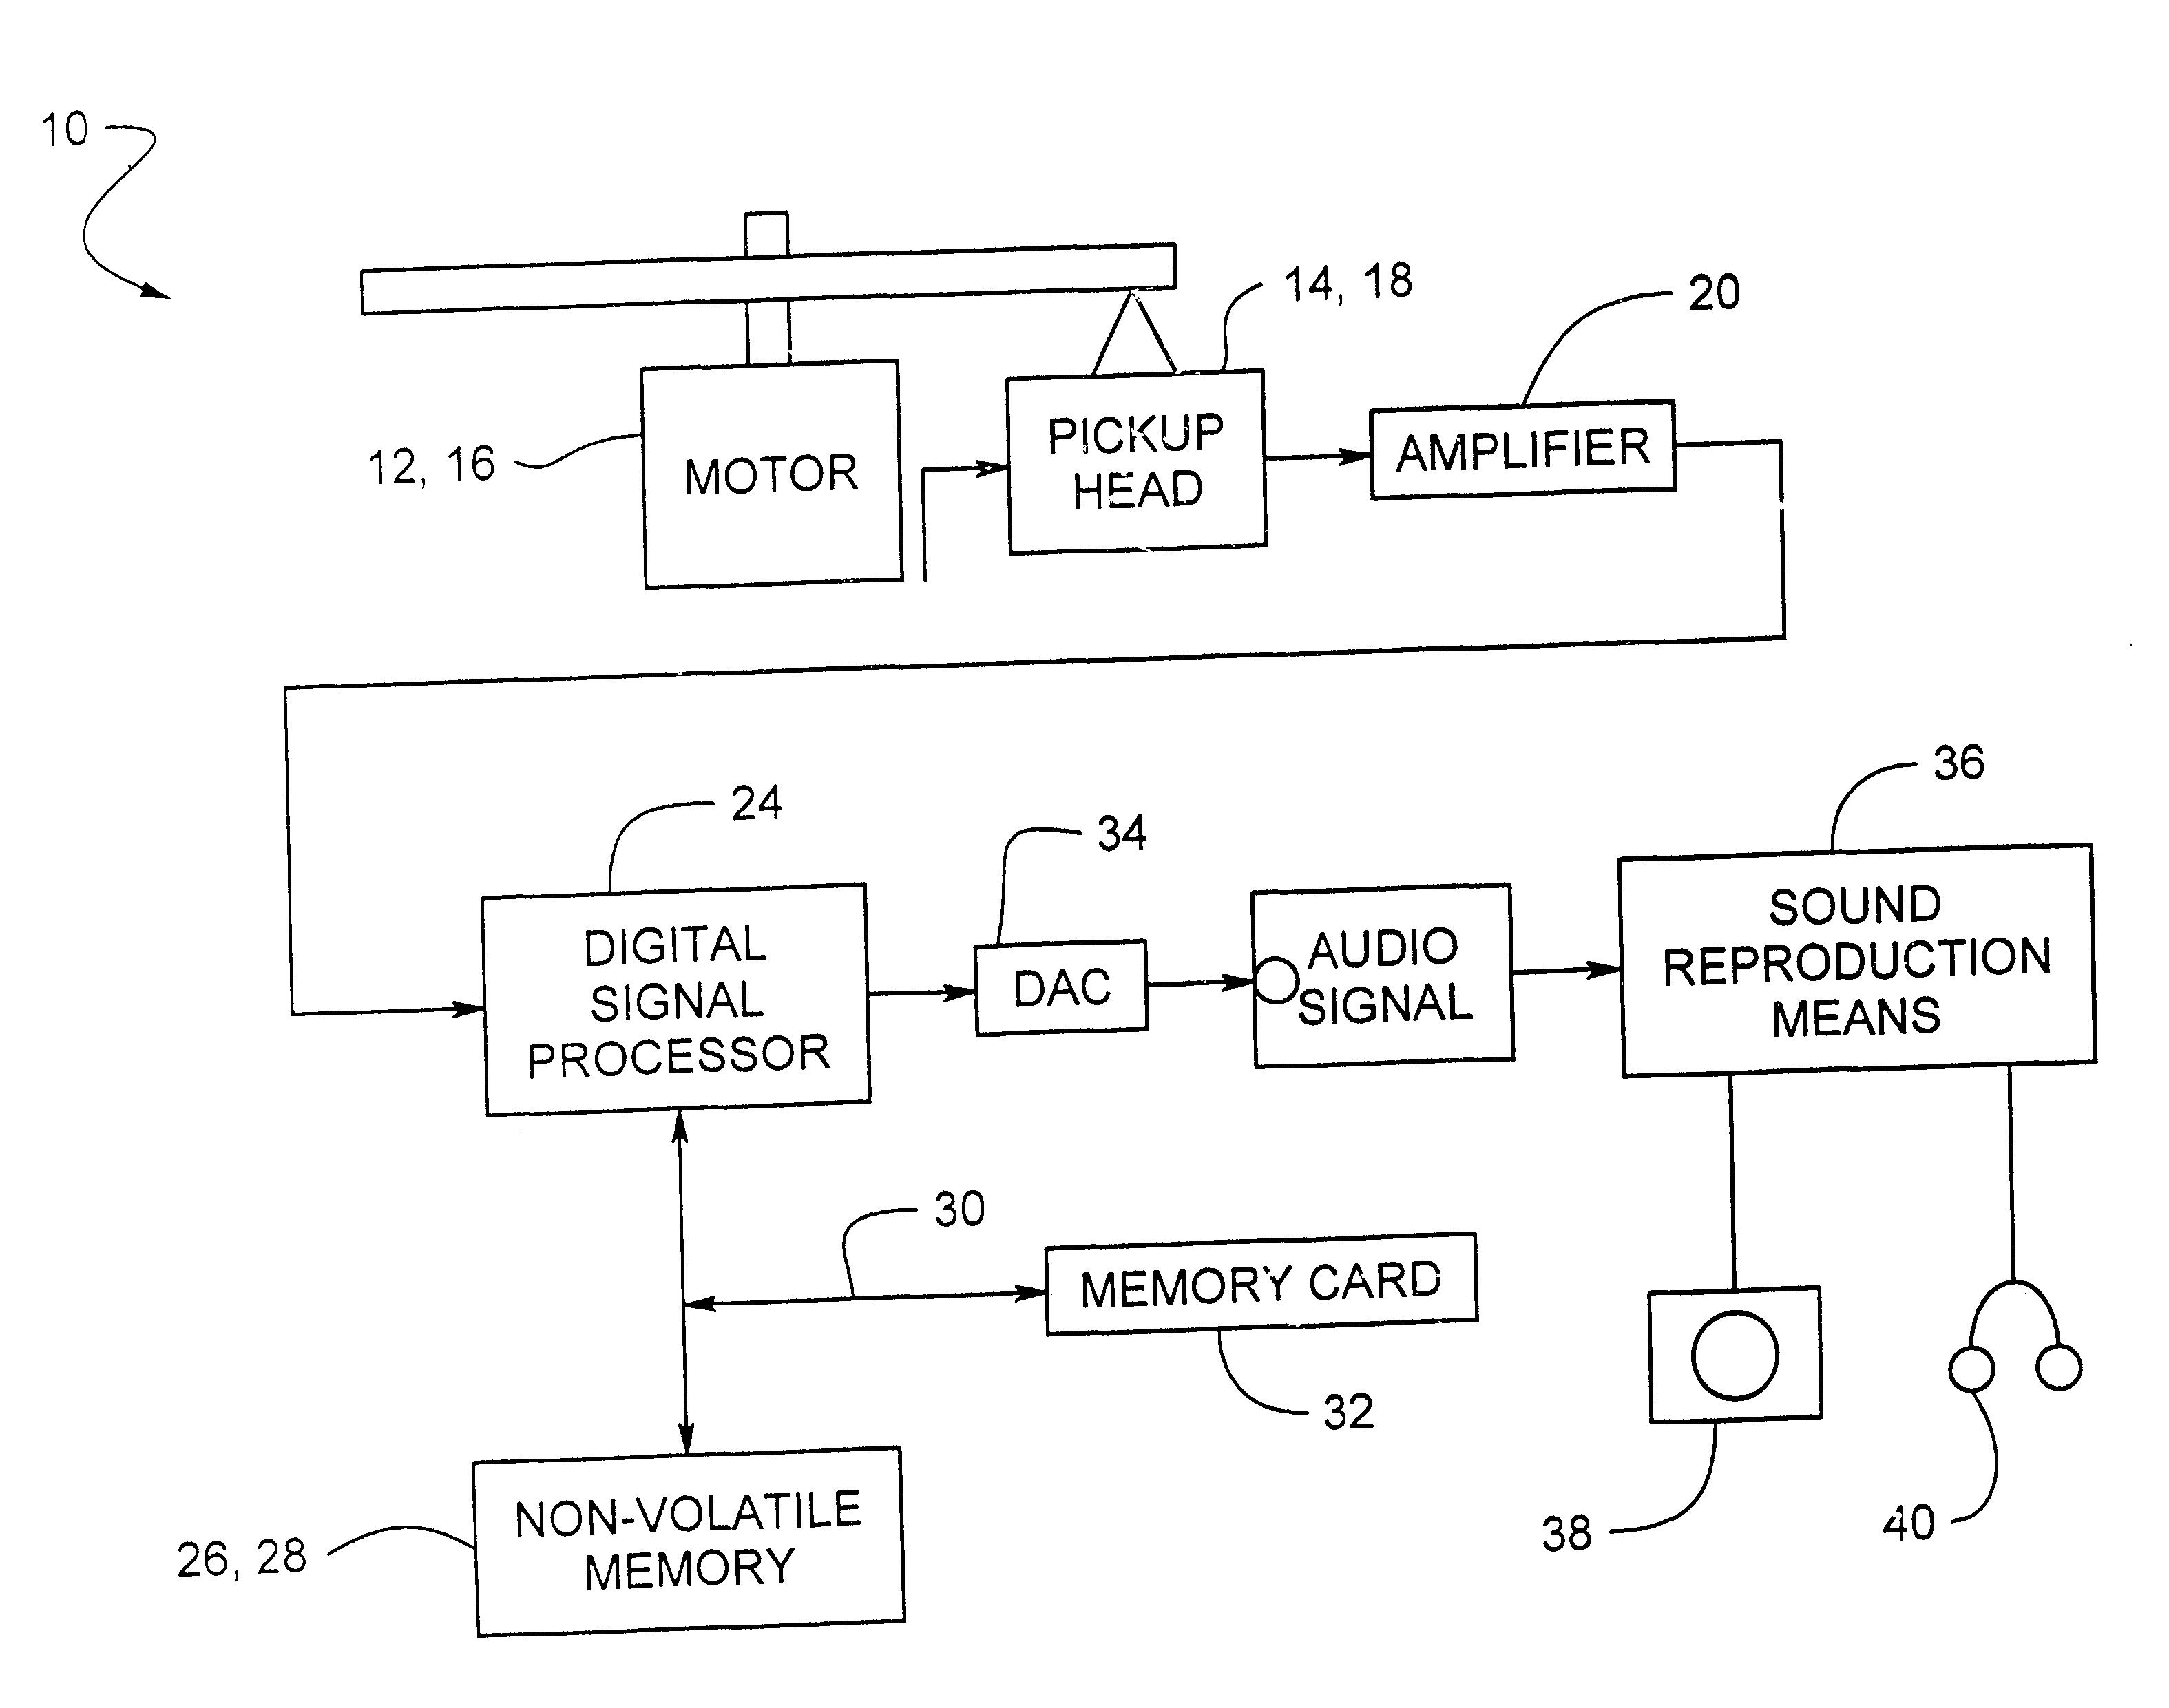 wiring diagram cd player patent us6366544 - universal cd player - google patents